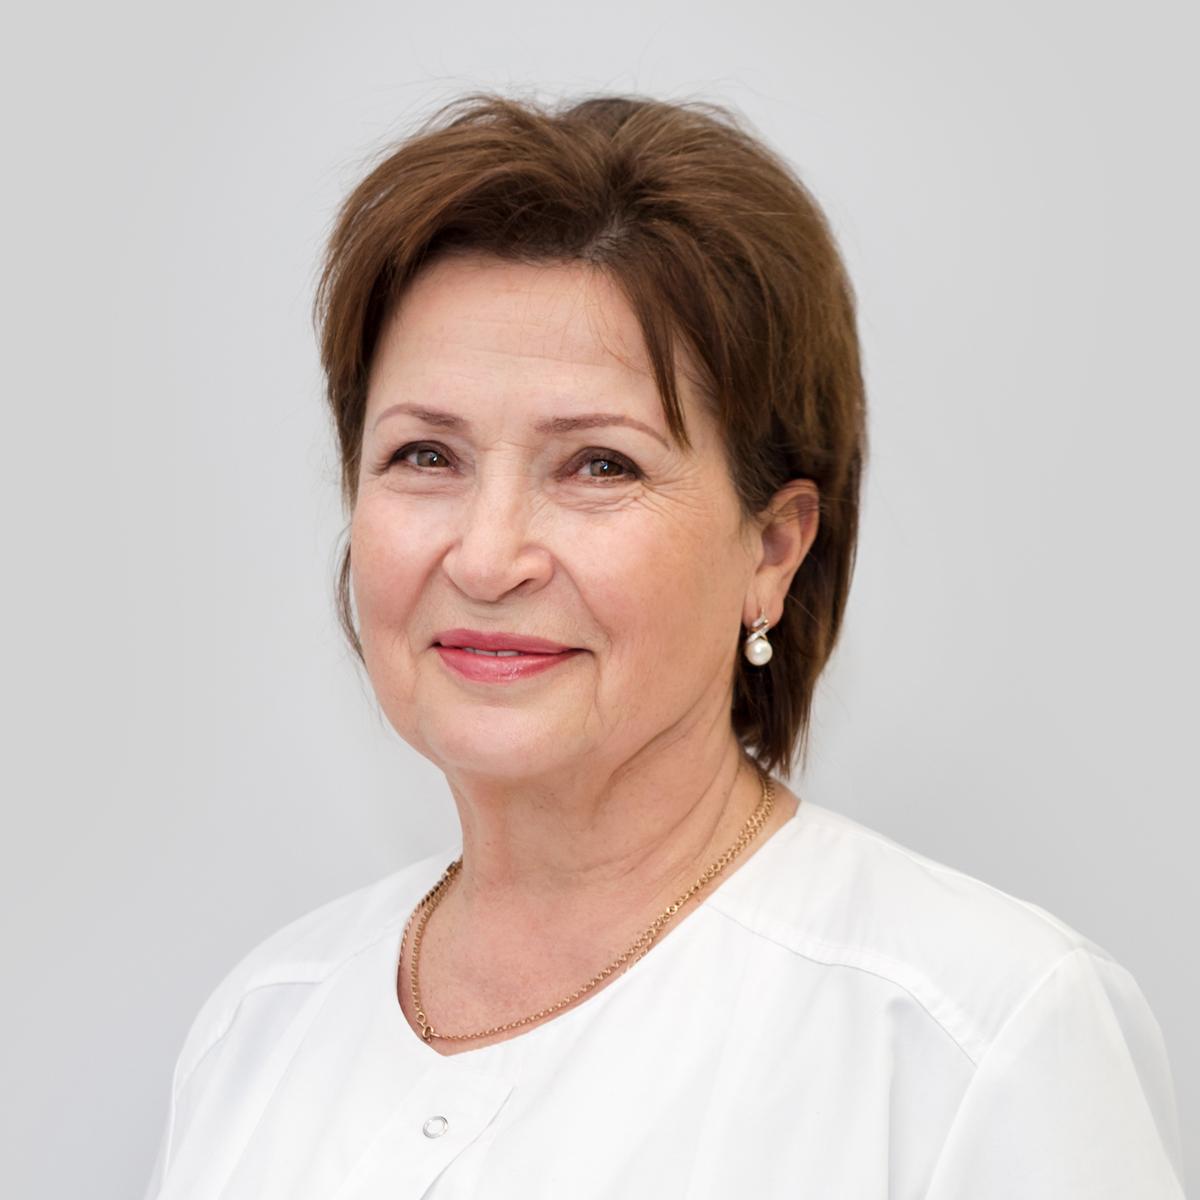 Новак Людмила Пантелеевна